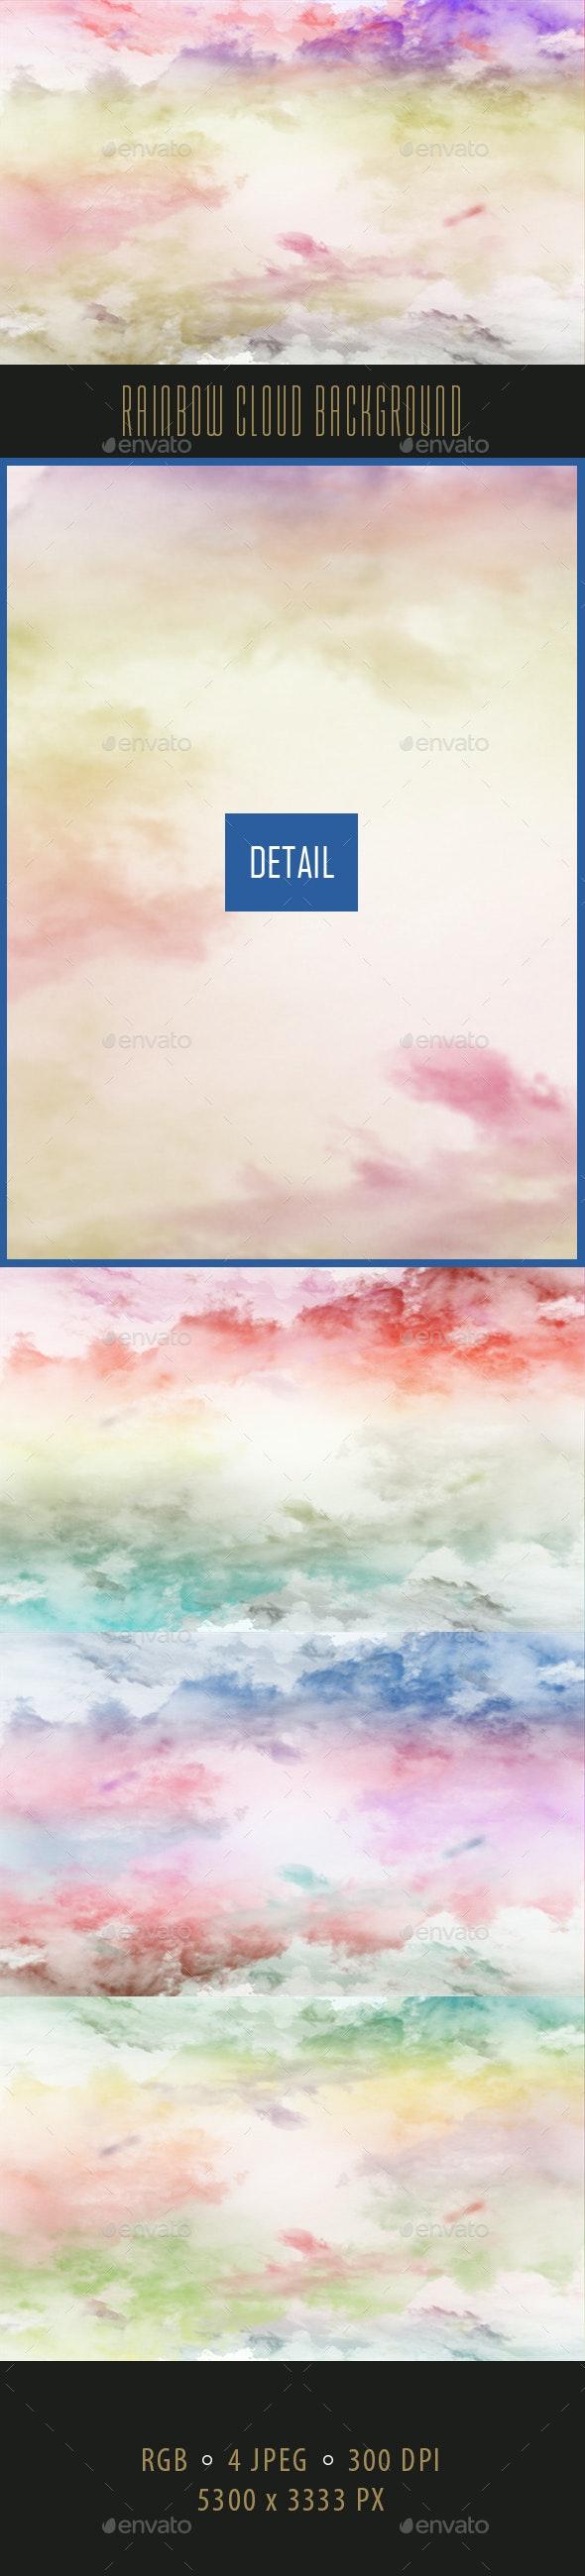 Rainbow Cloud Background - Backgrounds Graphics